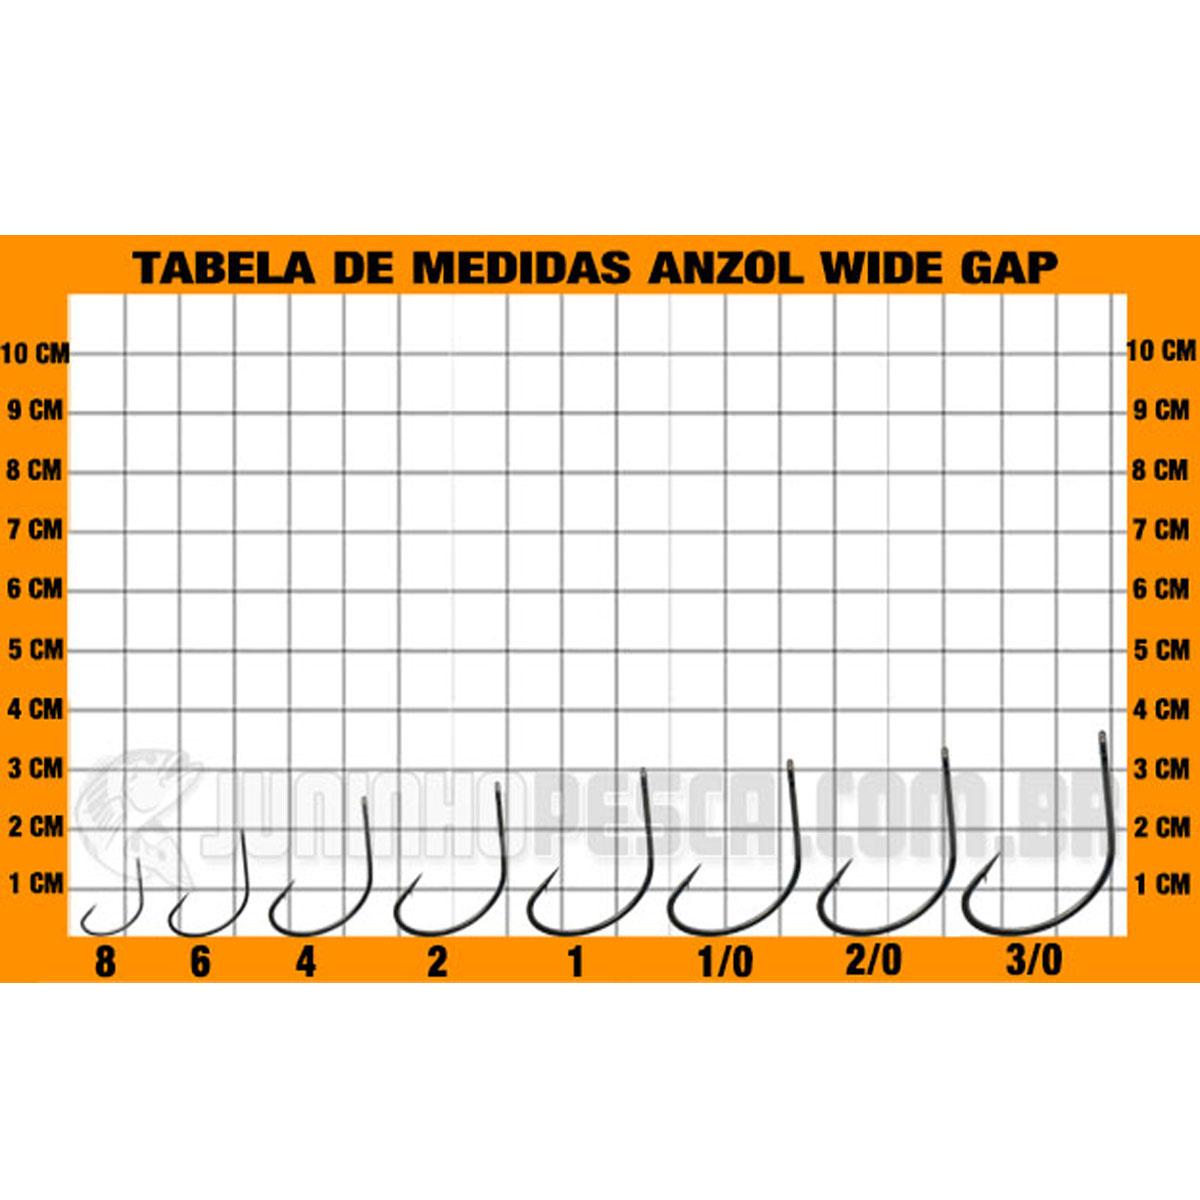 Anzol  Pinnacle Wide Gap nº 01  - Pró Pesca Shop